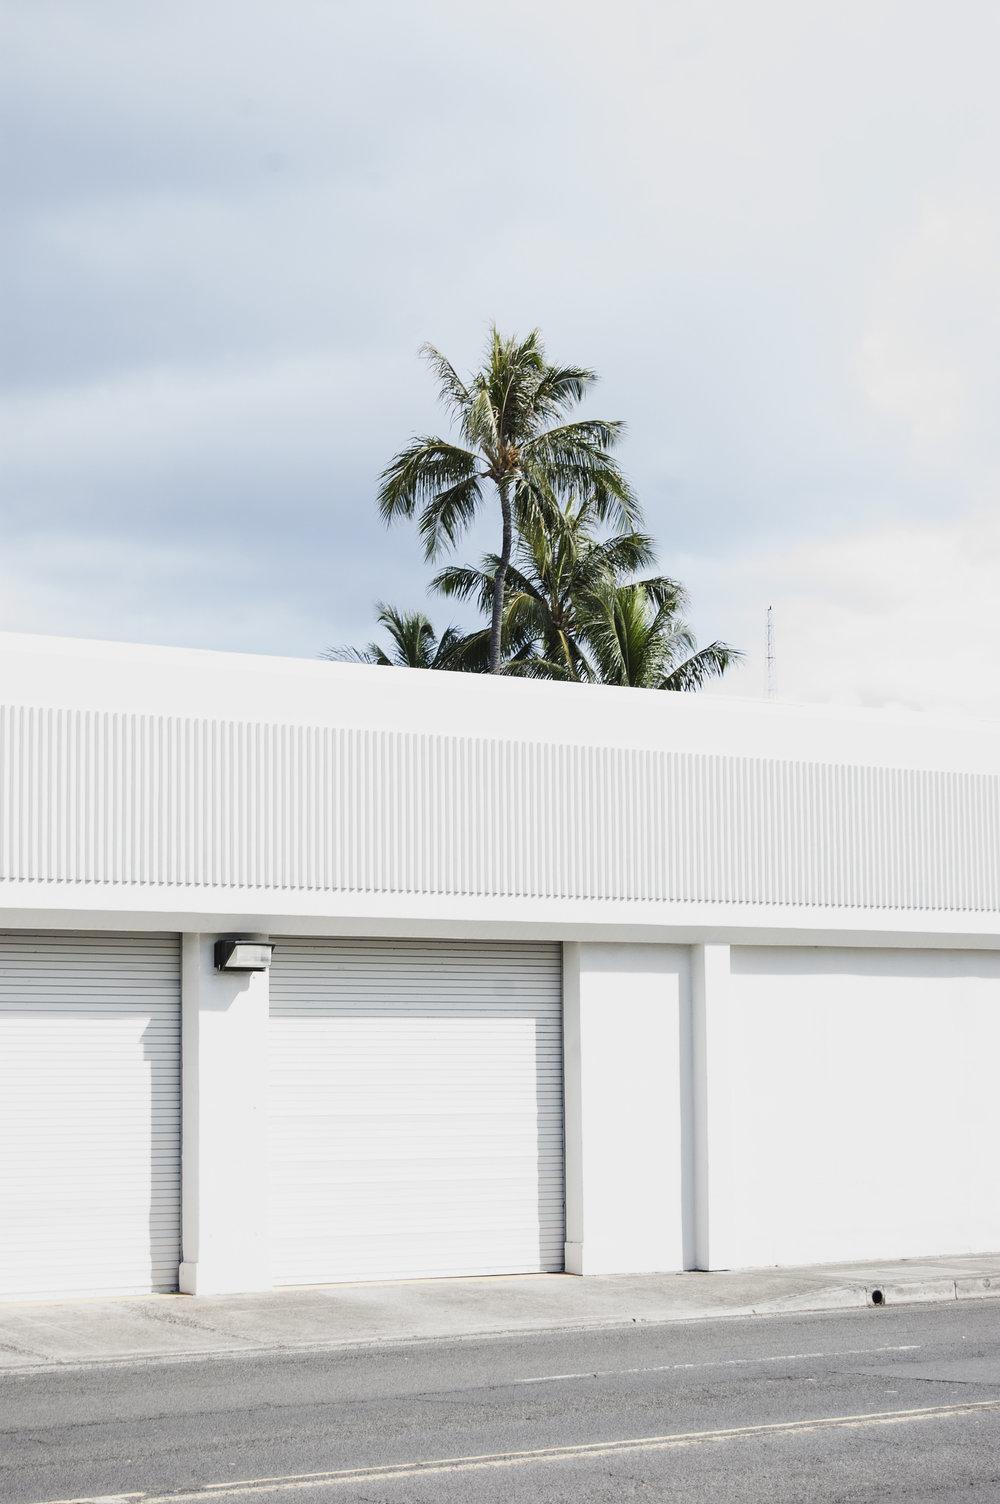 peeky_palm_trees.jpg